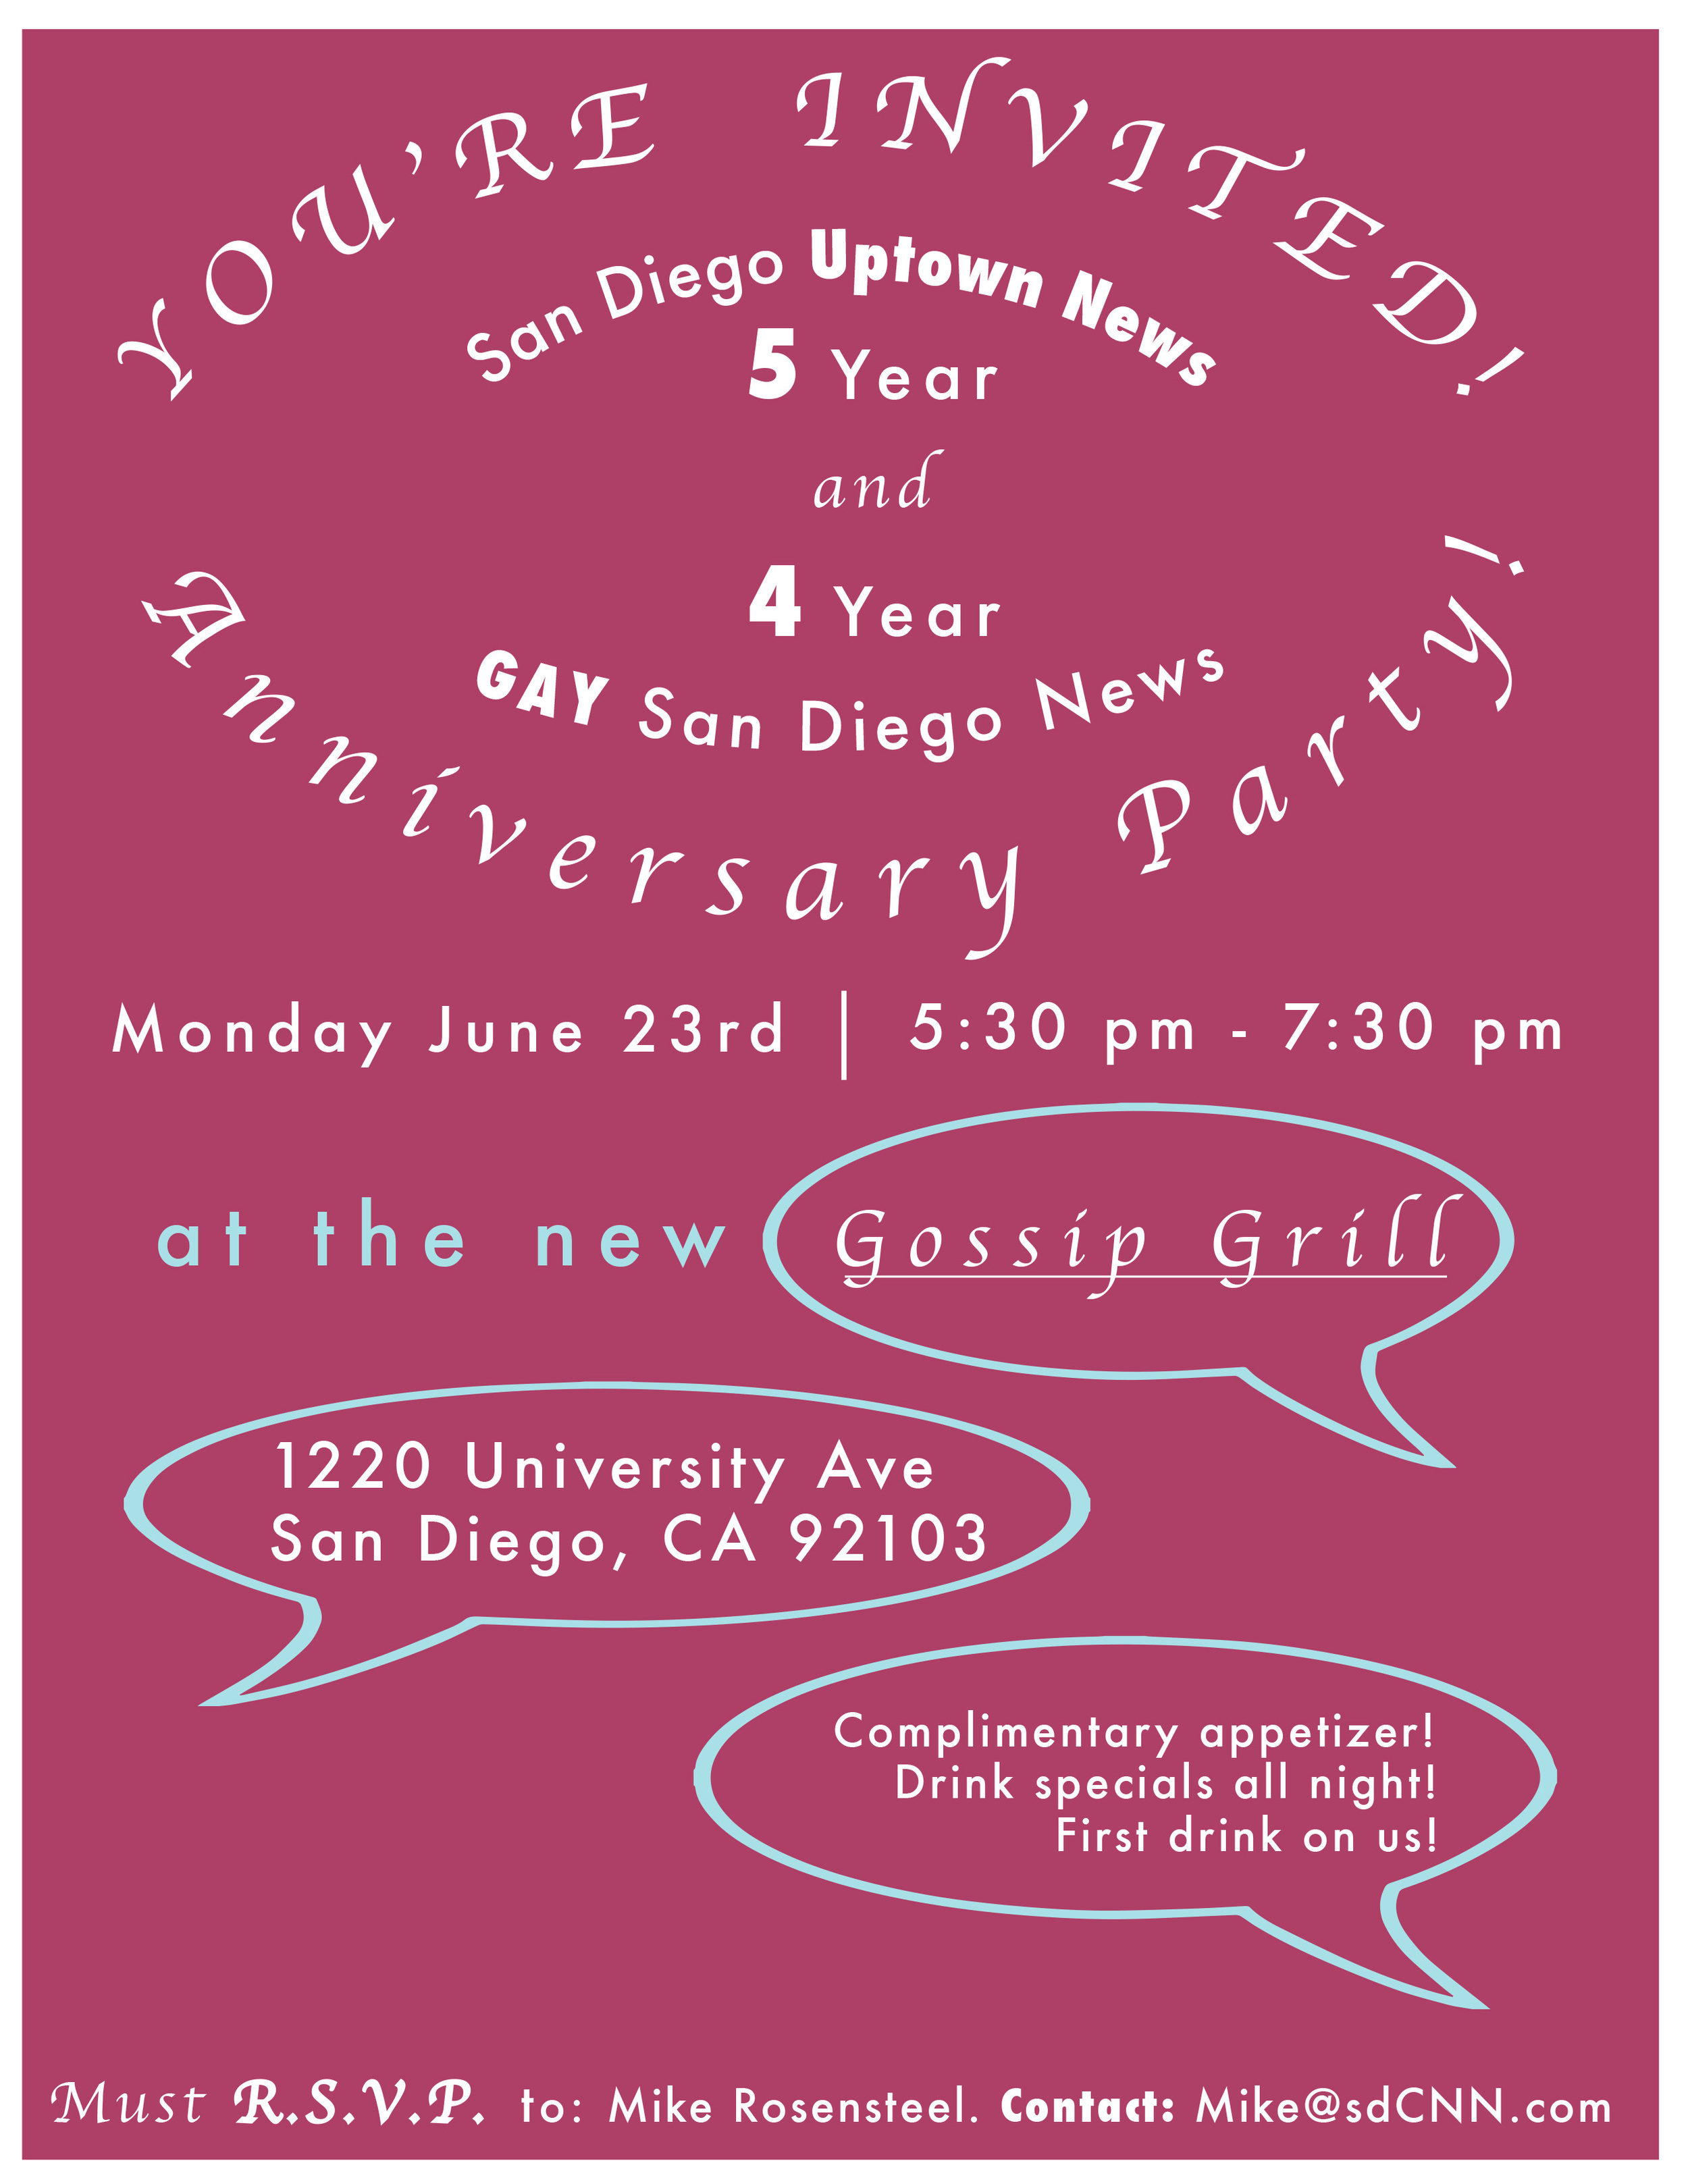 event.invitation.jpg